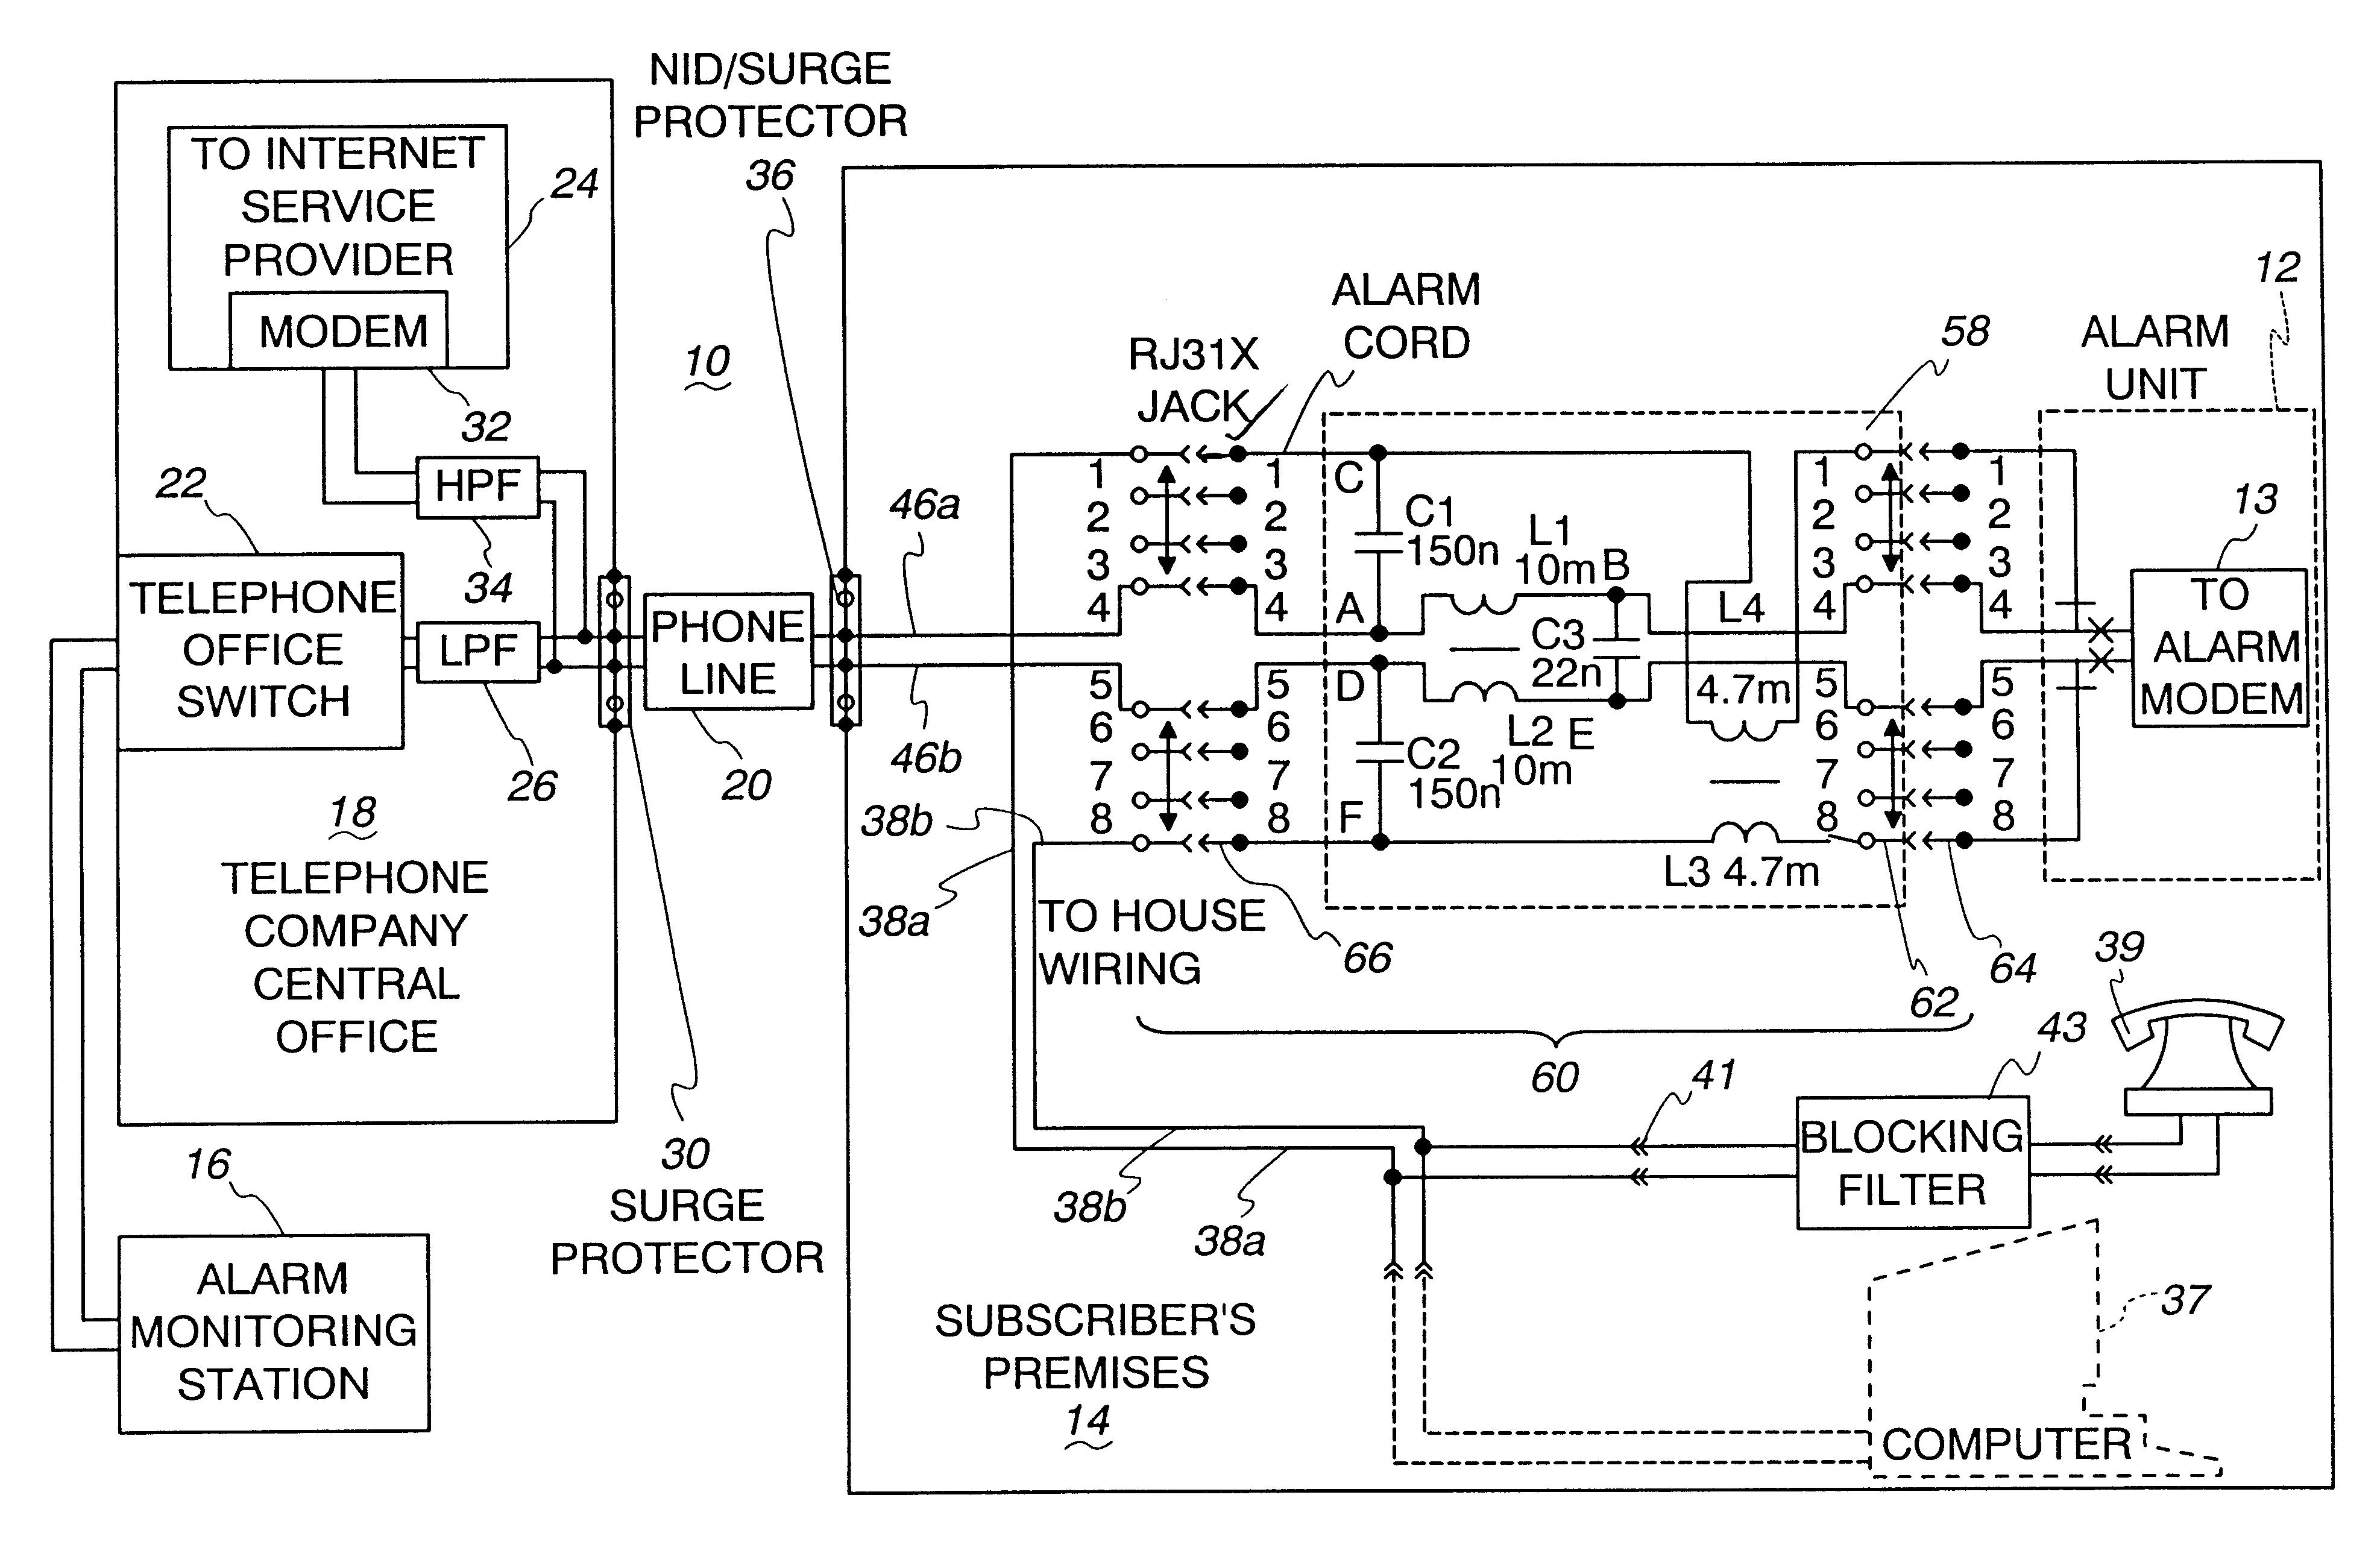 rj31x wiring diagram annavernon rj31x wiring diagram schematic my subaru diagrams